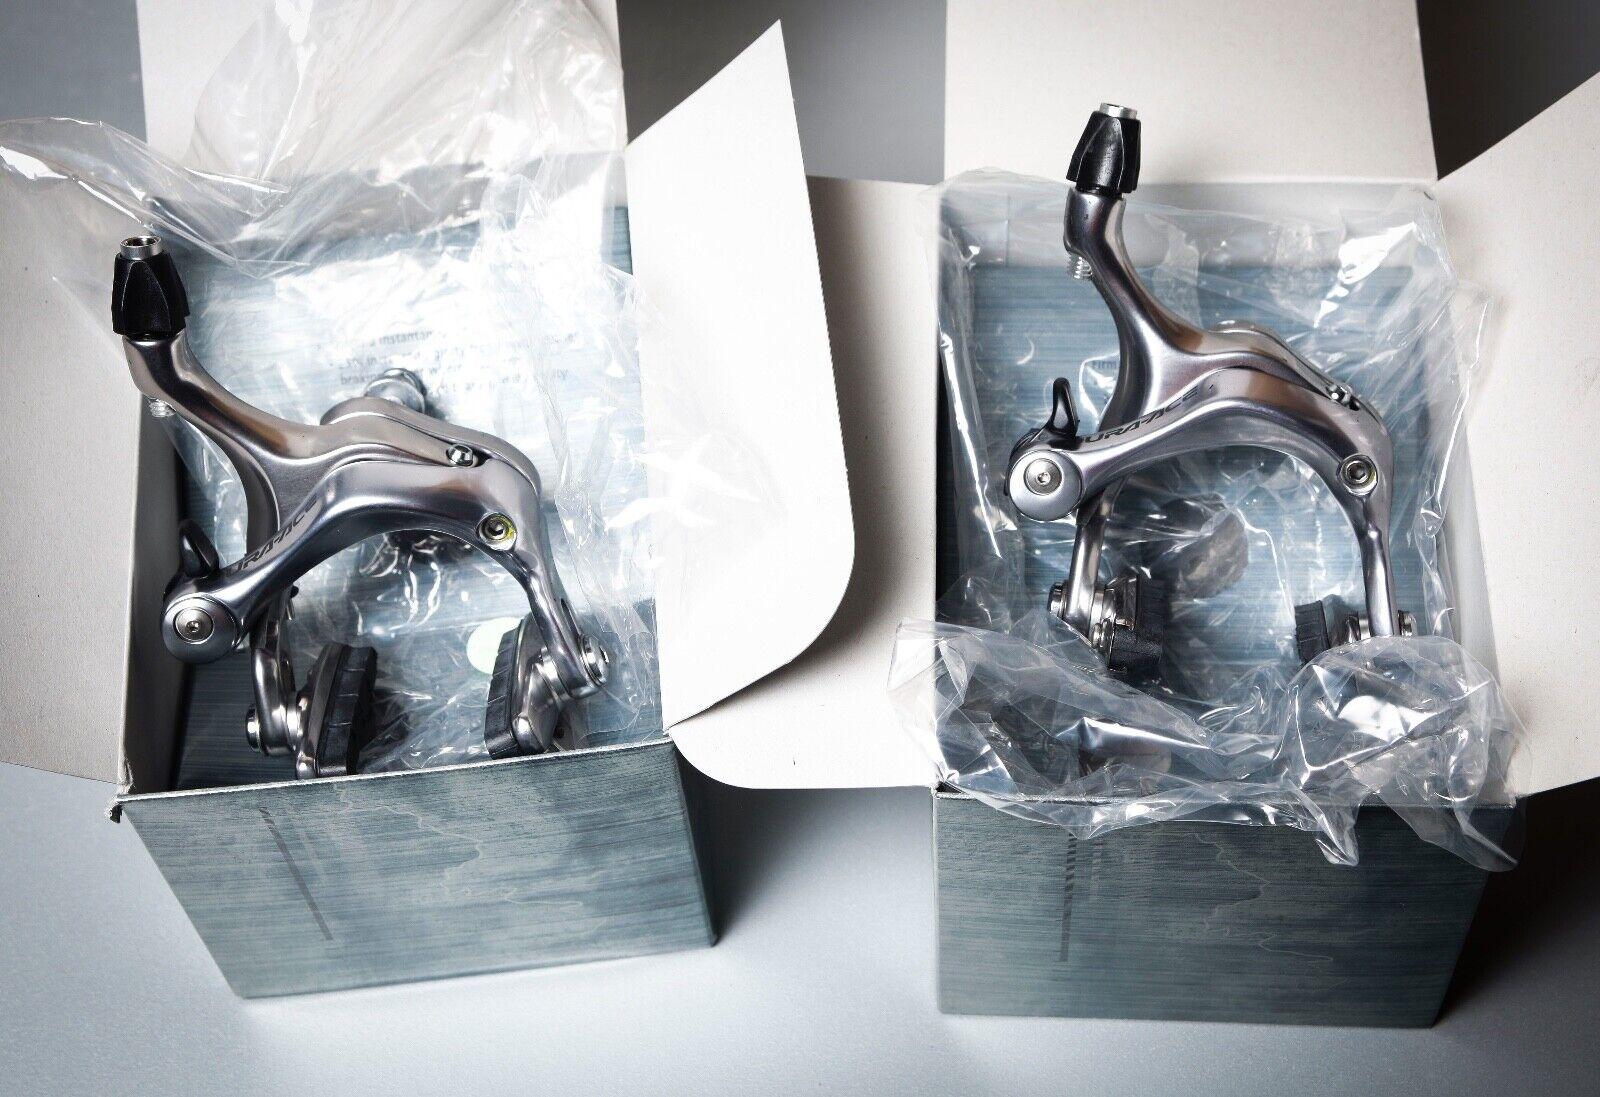 SET KIT Shimano BR7800 DuraAce Brakes Calipers  pinze freno NUOVE NEW NOS